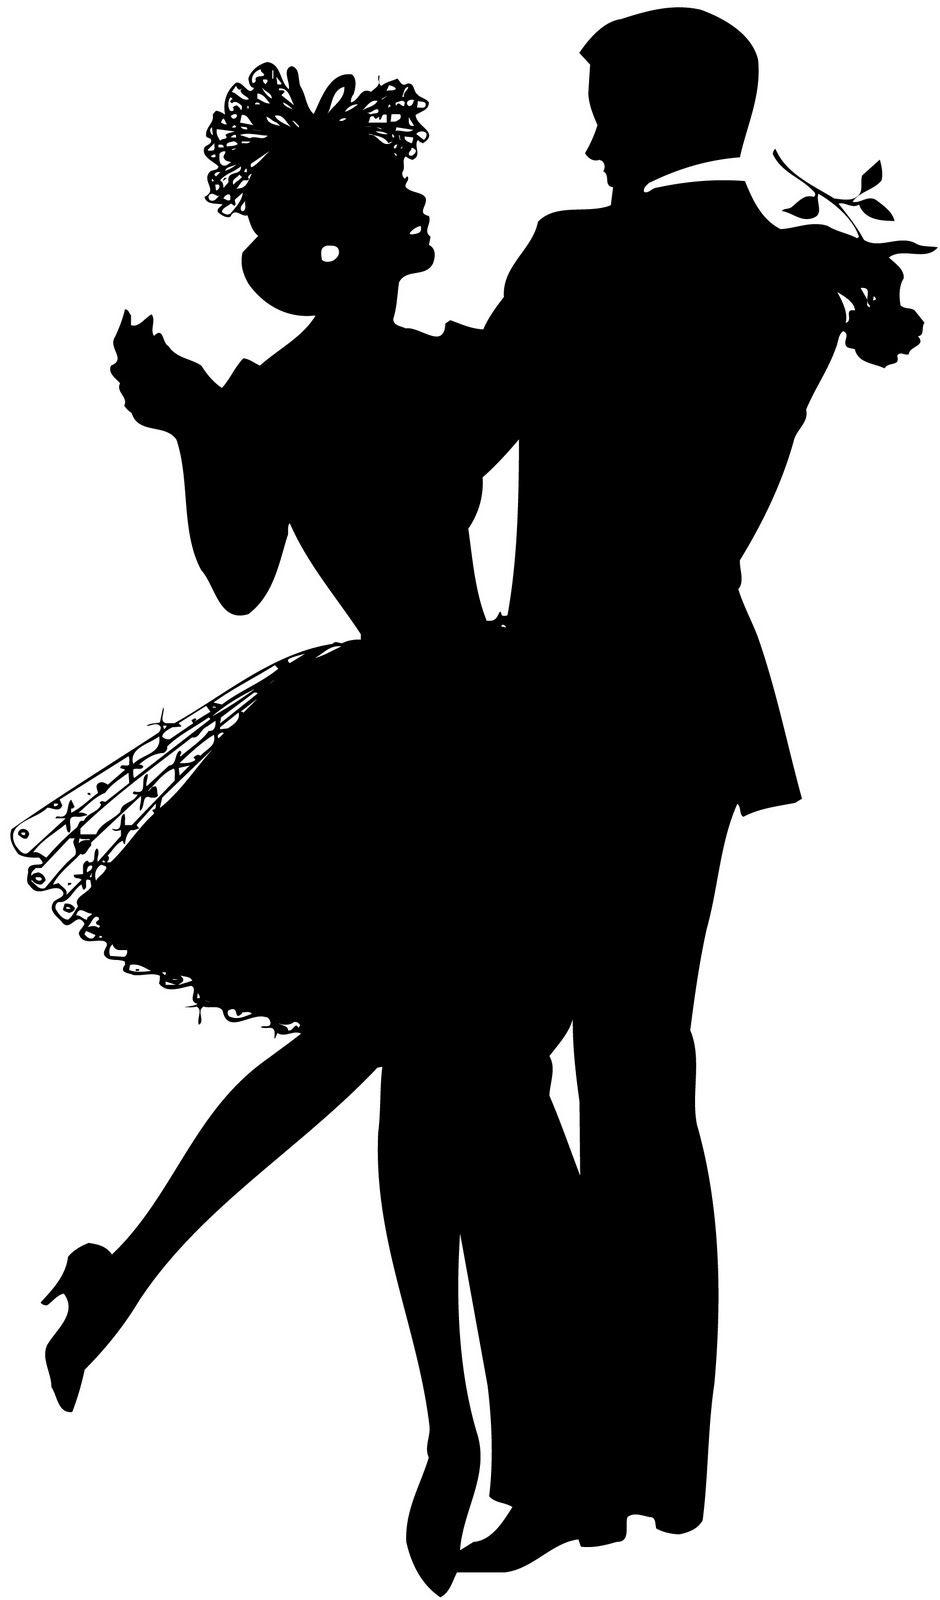 White apron clipart - Silhouette Dancing Couple